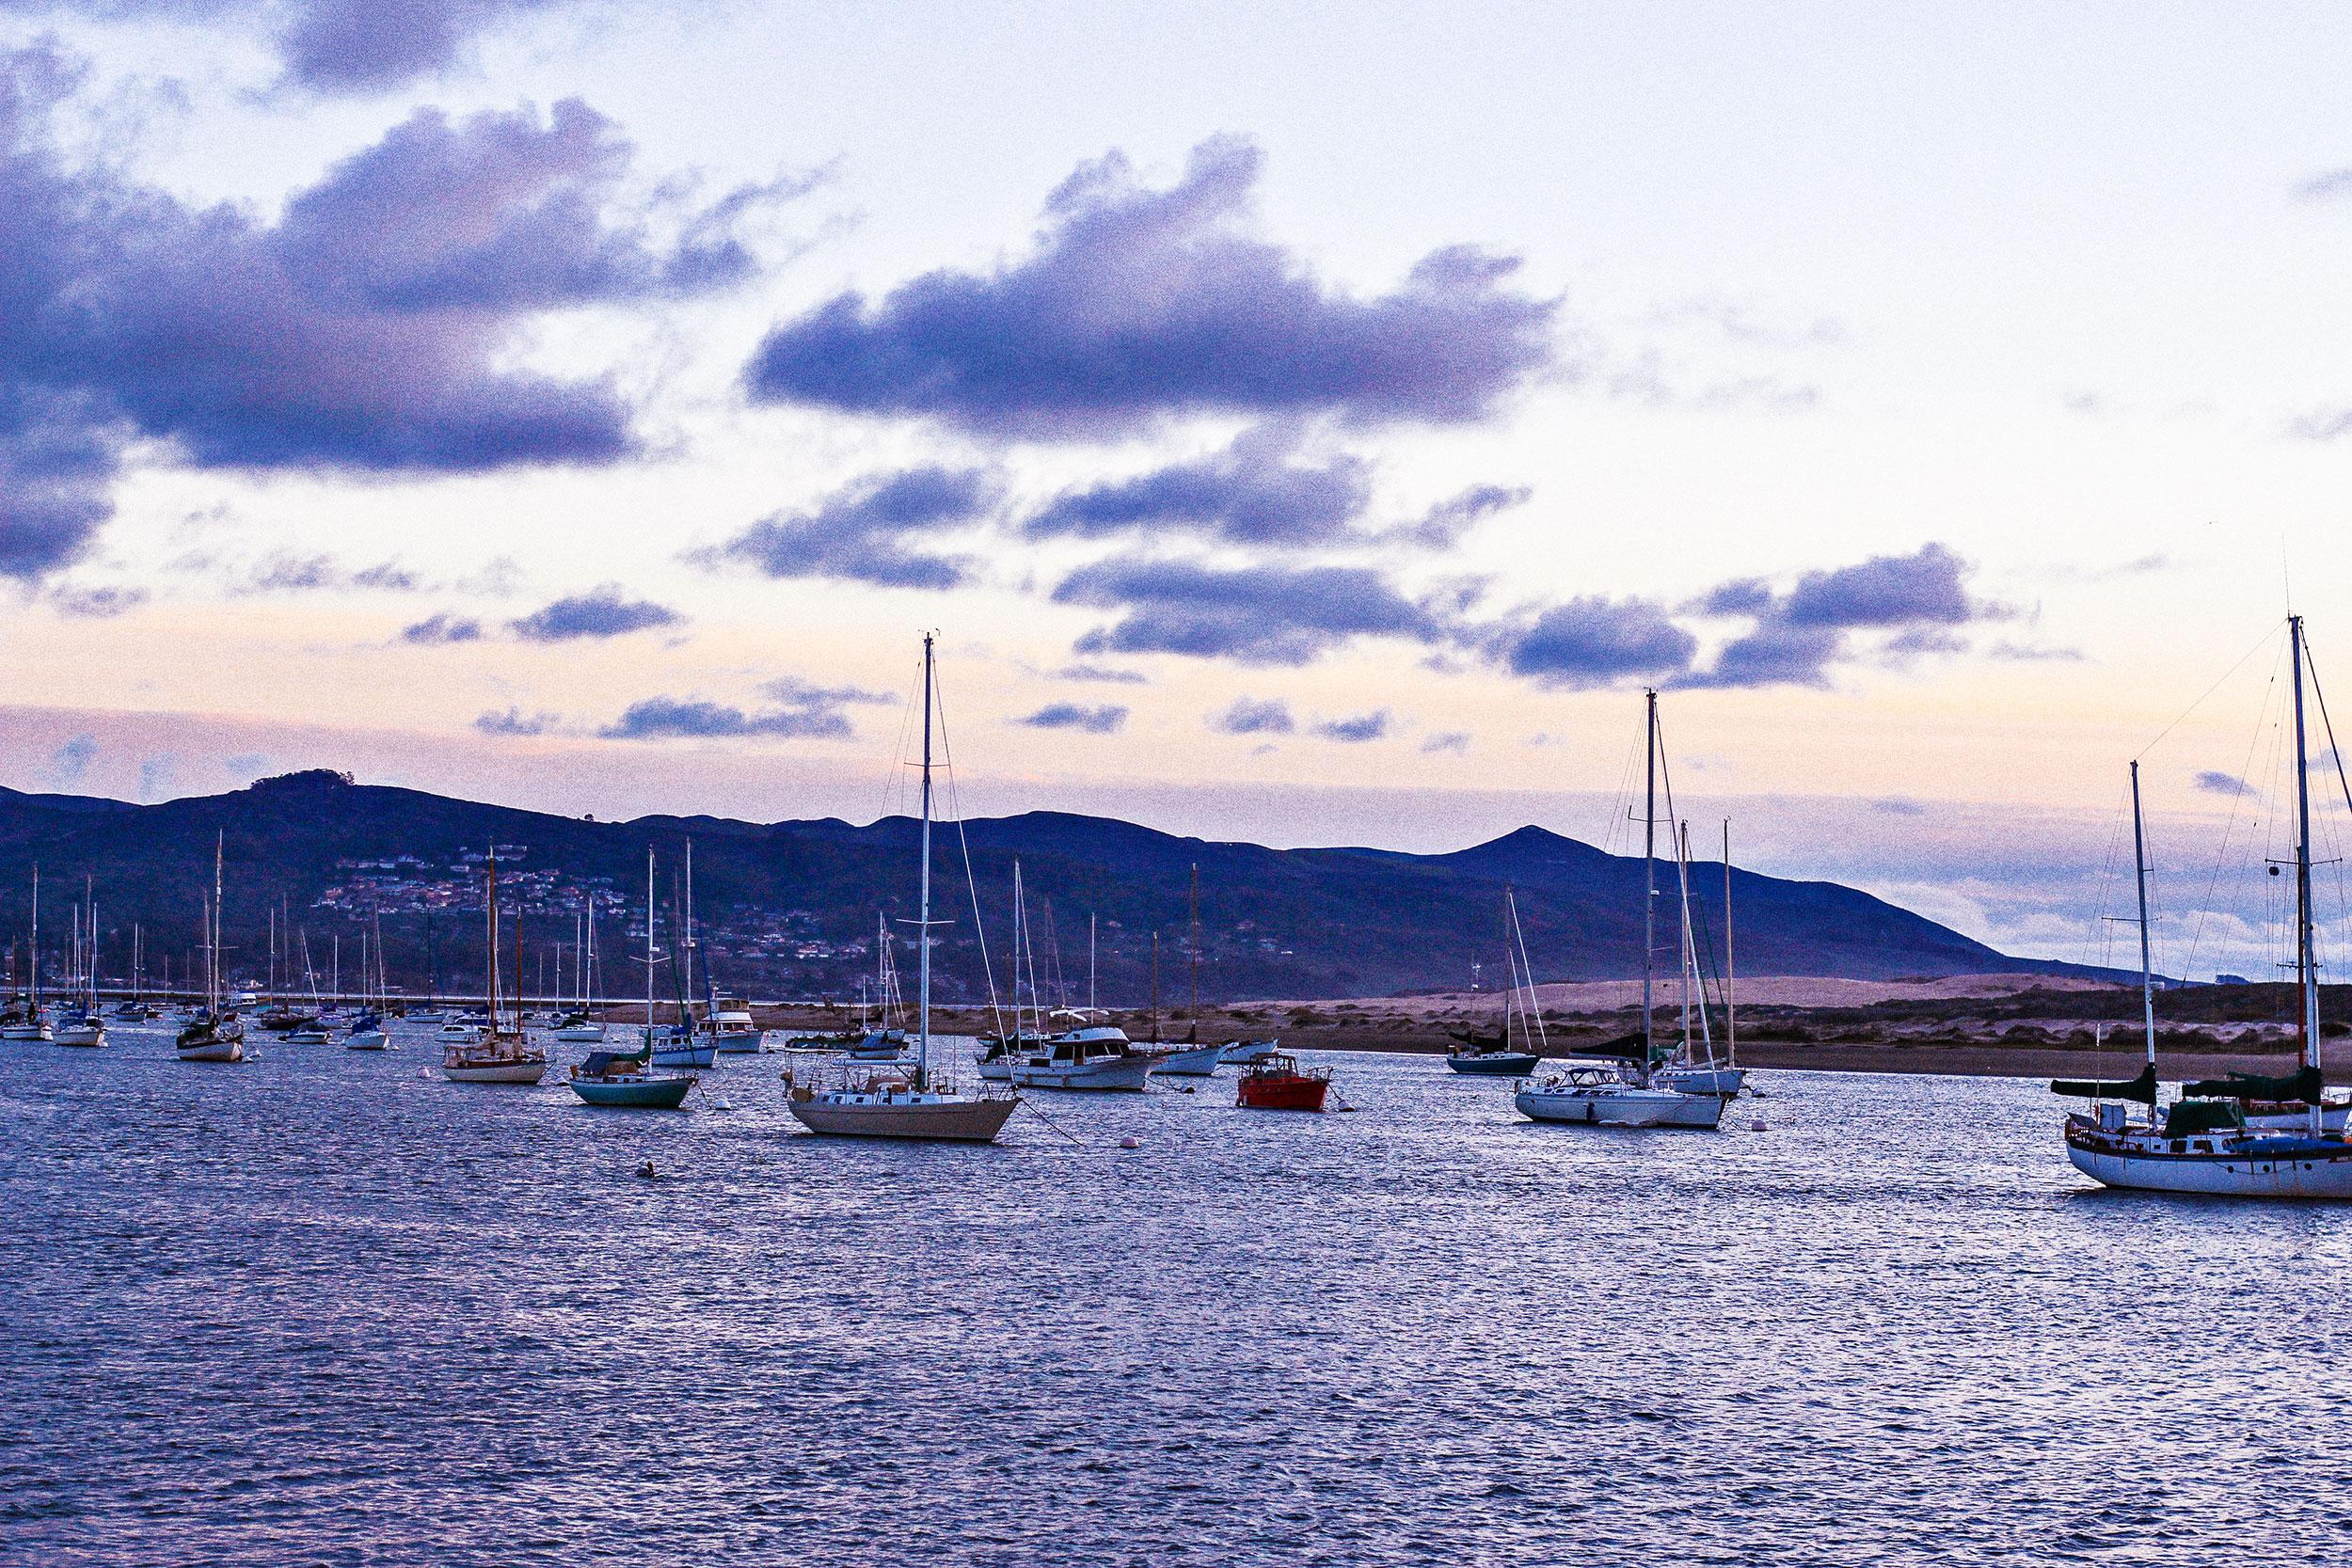 Morro-Bay-Boats.jpg